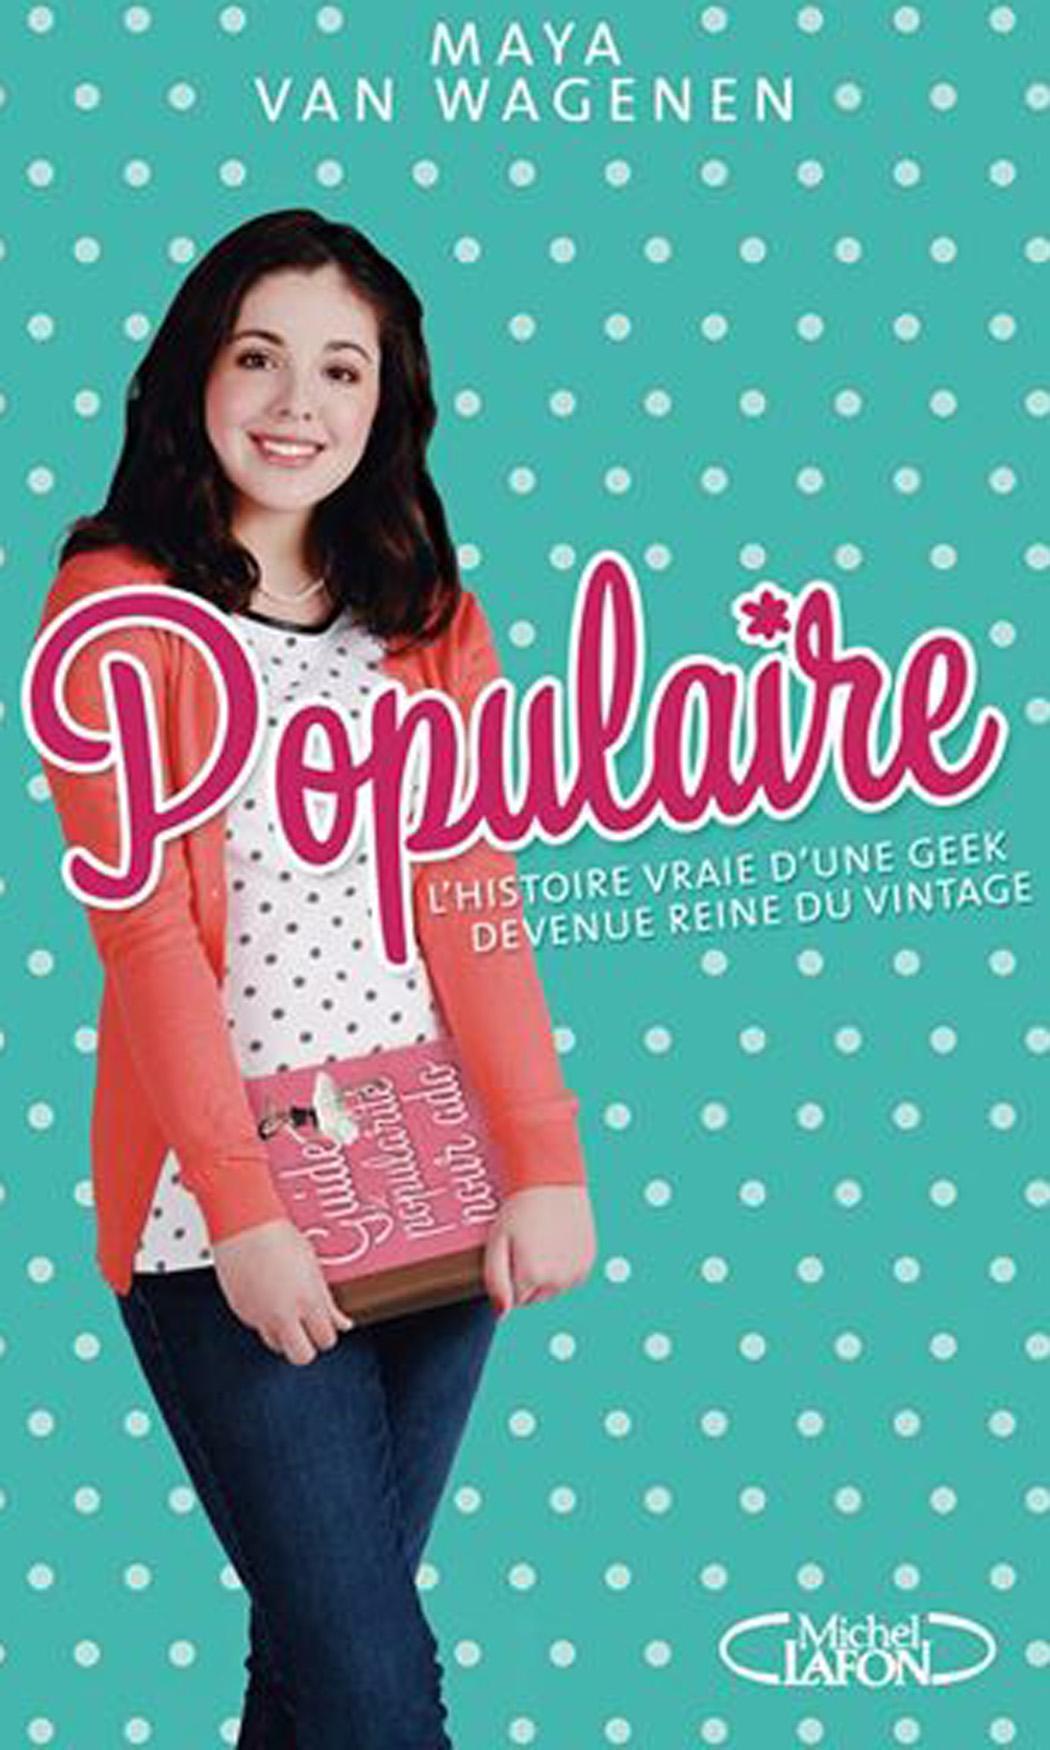 Film de l'adolescence populaire